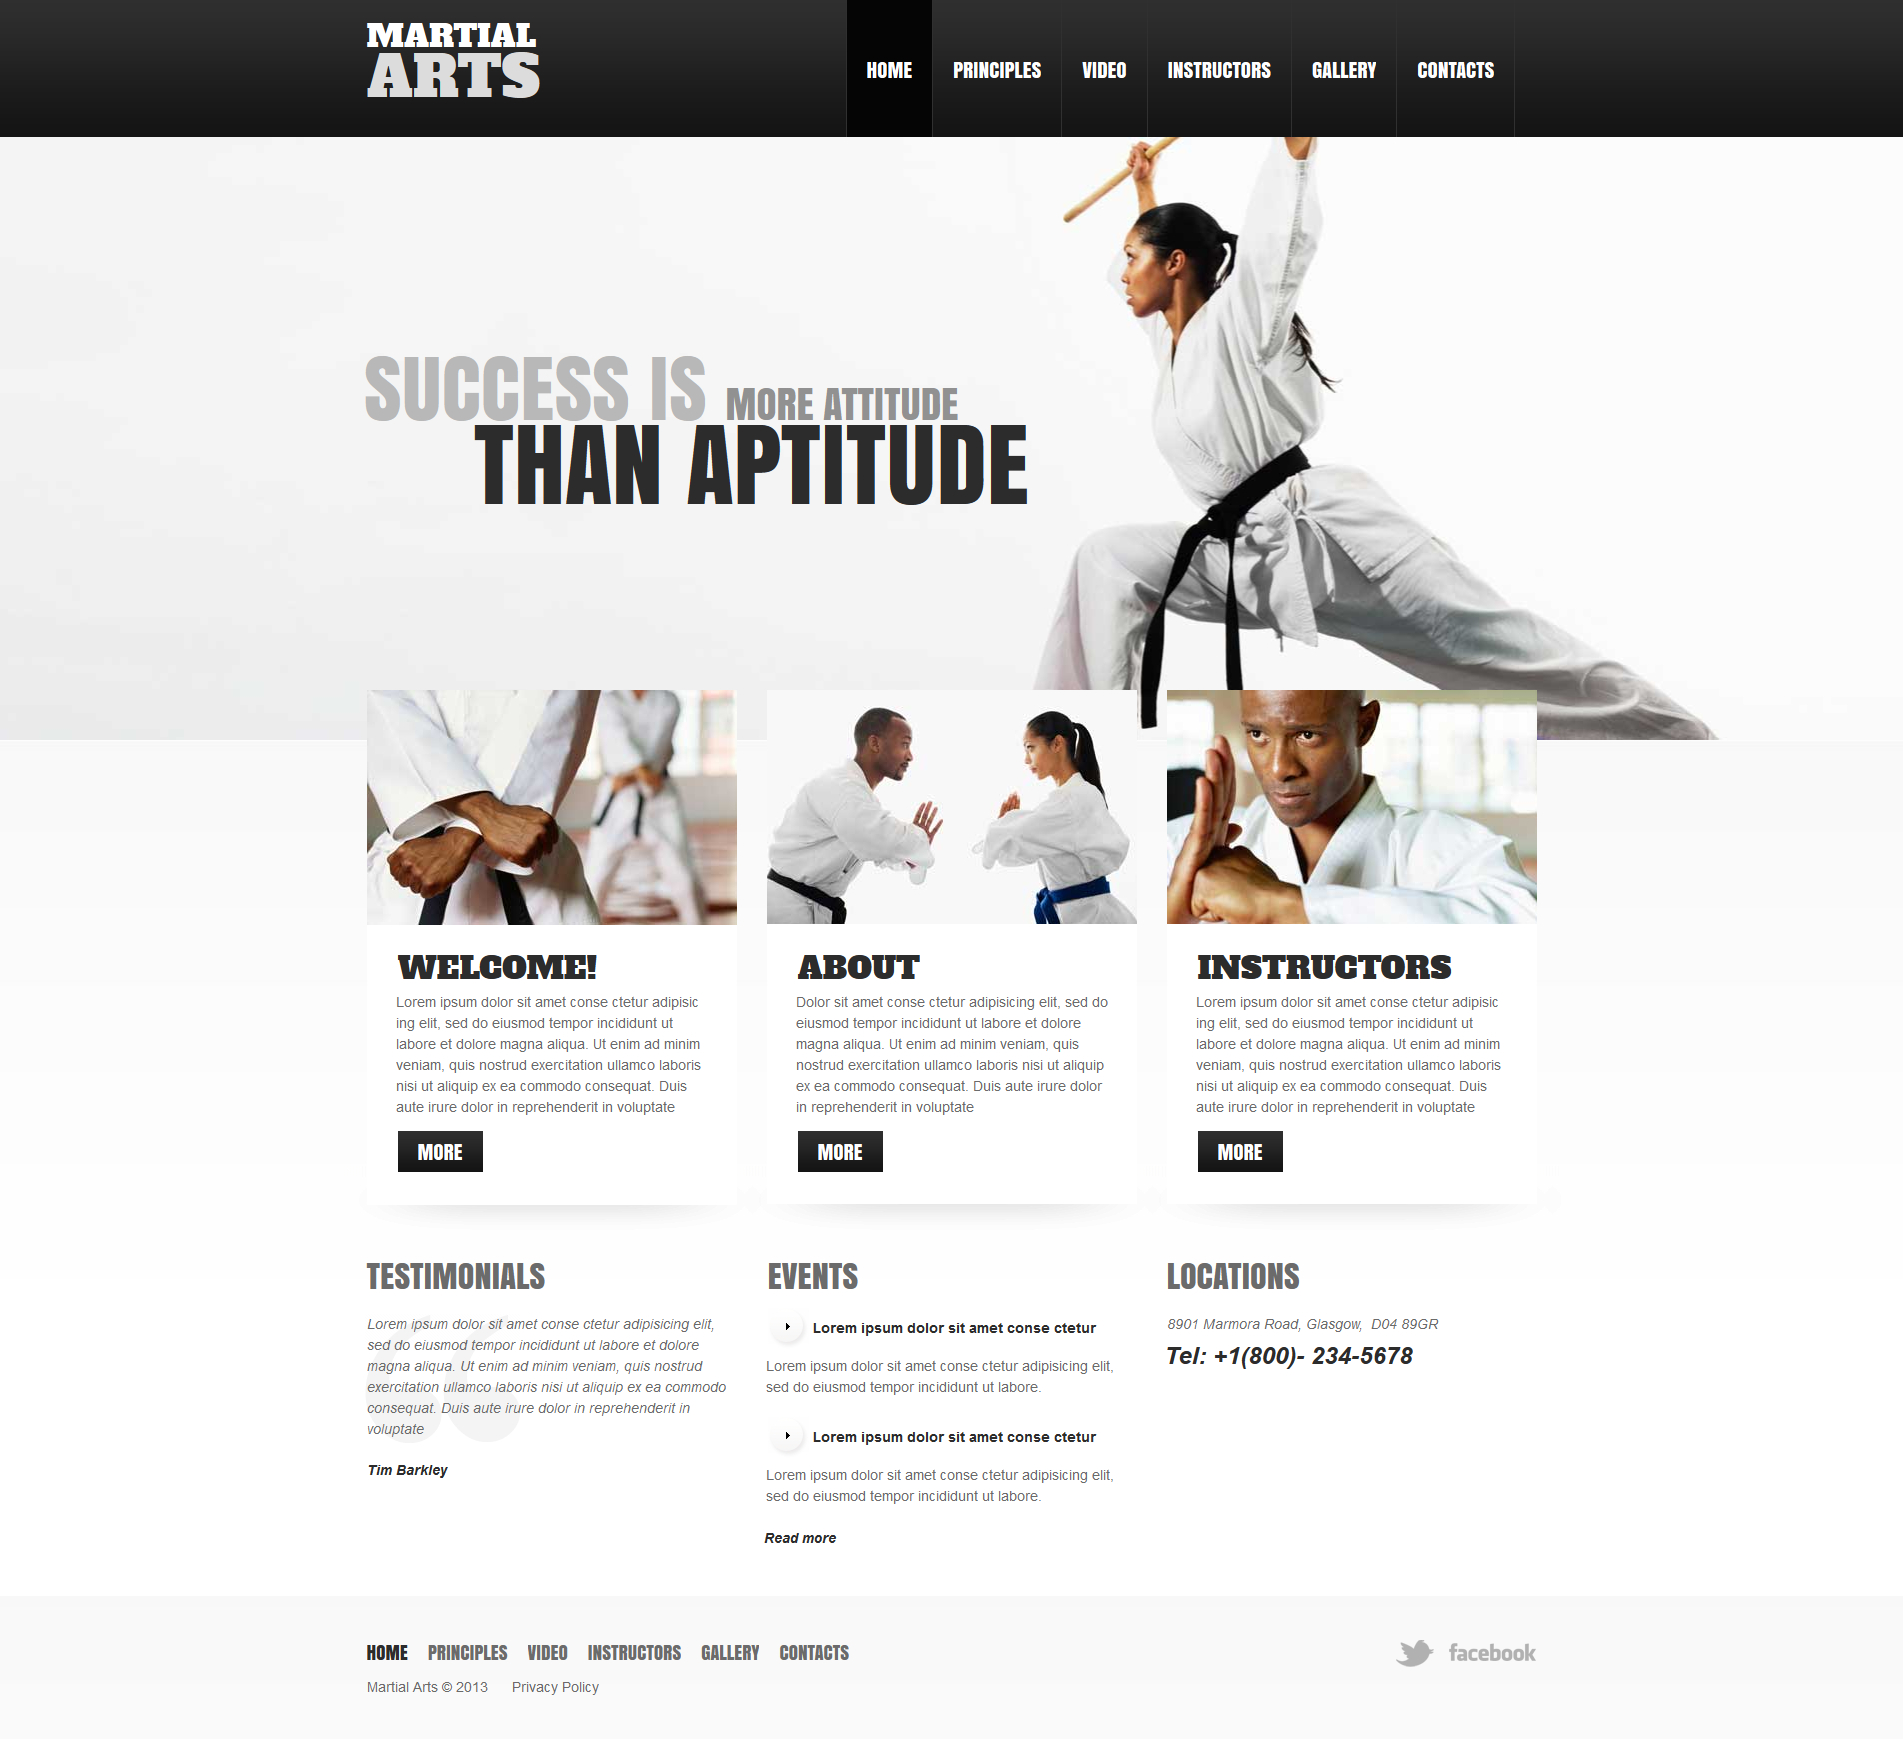 Martial arts moto cms html template 47474 martial arts moto cms html template toneelgroepblik Image collections